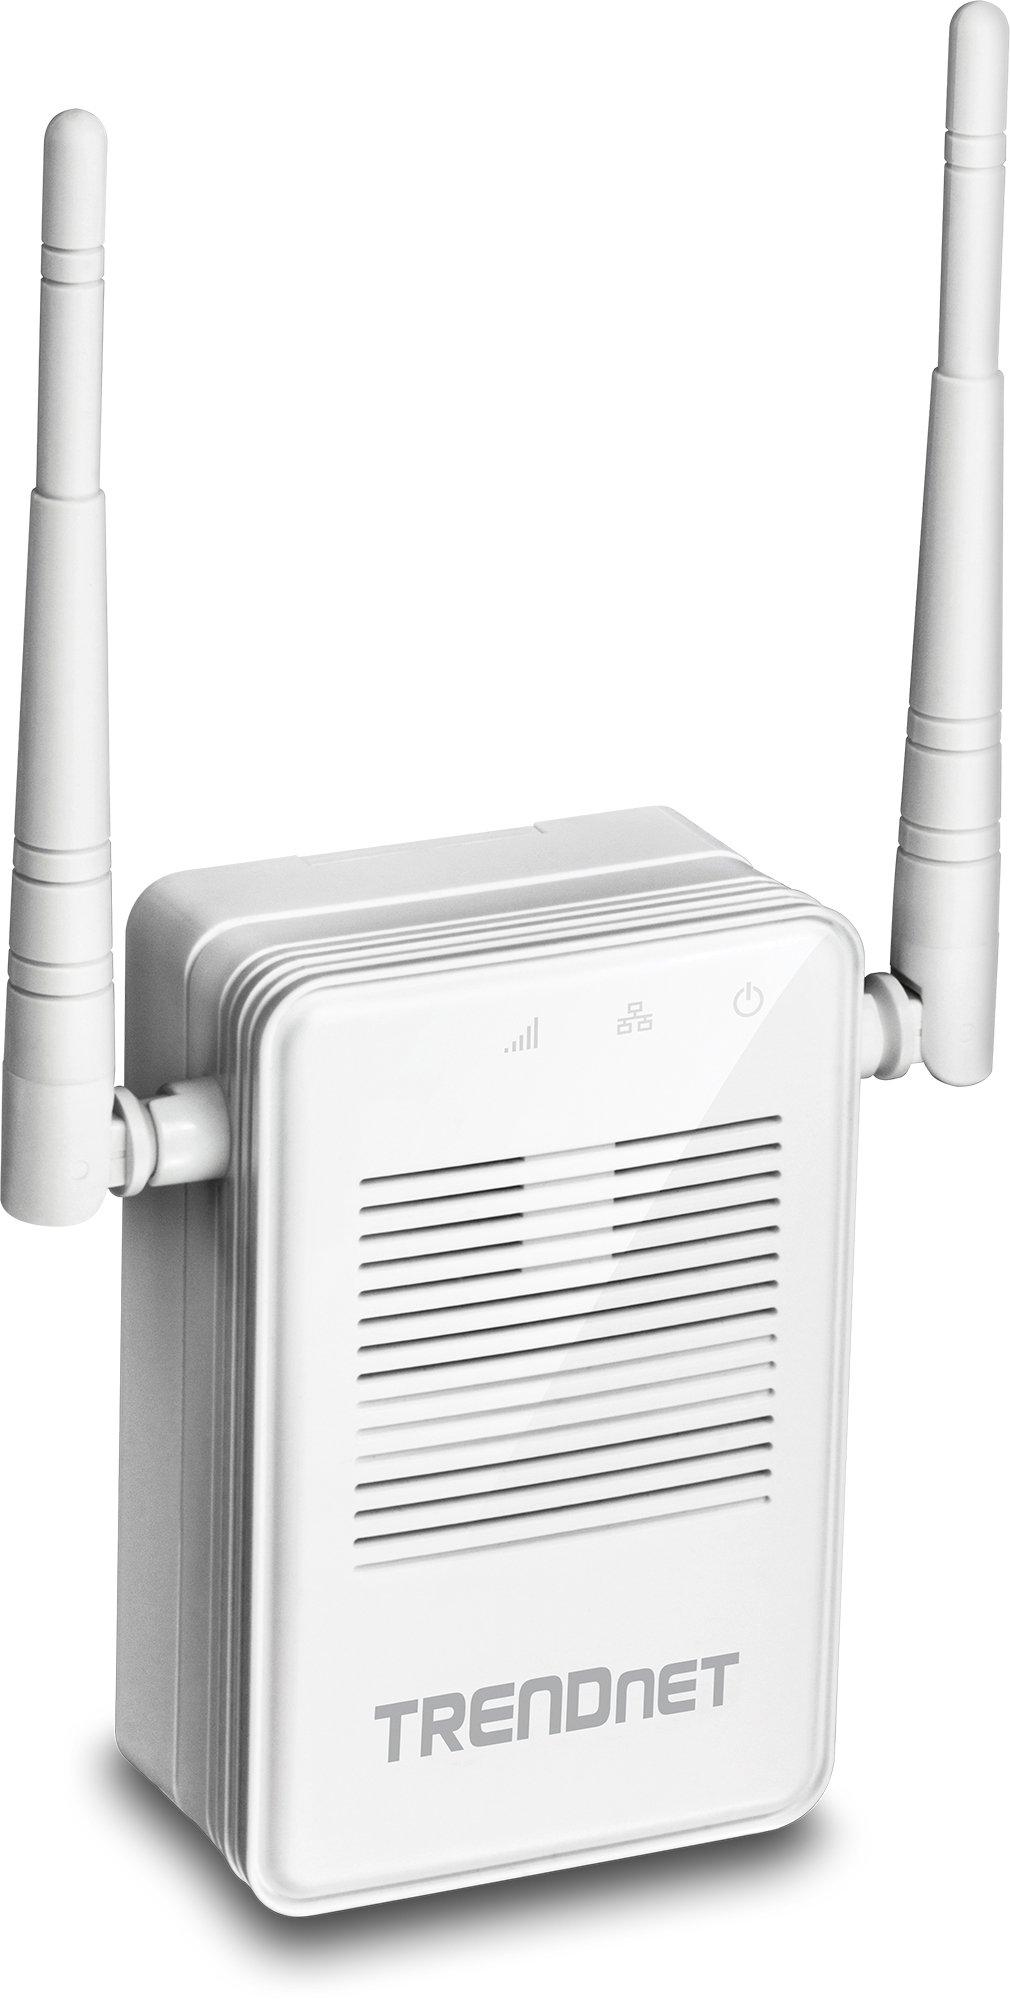 TRENDnet AC1200 WiFi Range Extender, Gigabit, MIMO, Dual Band, Beamforming, TEW-822DRE by TRENDnet